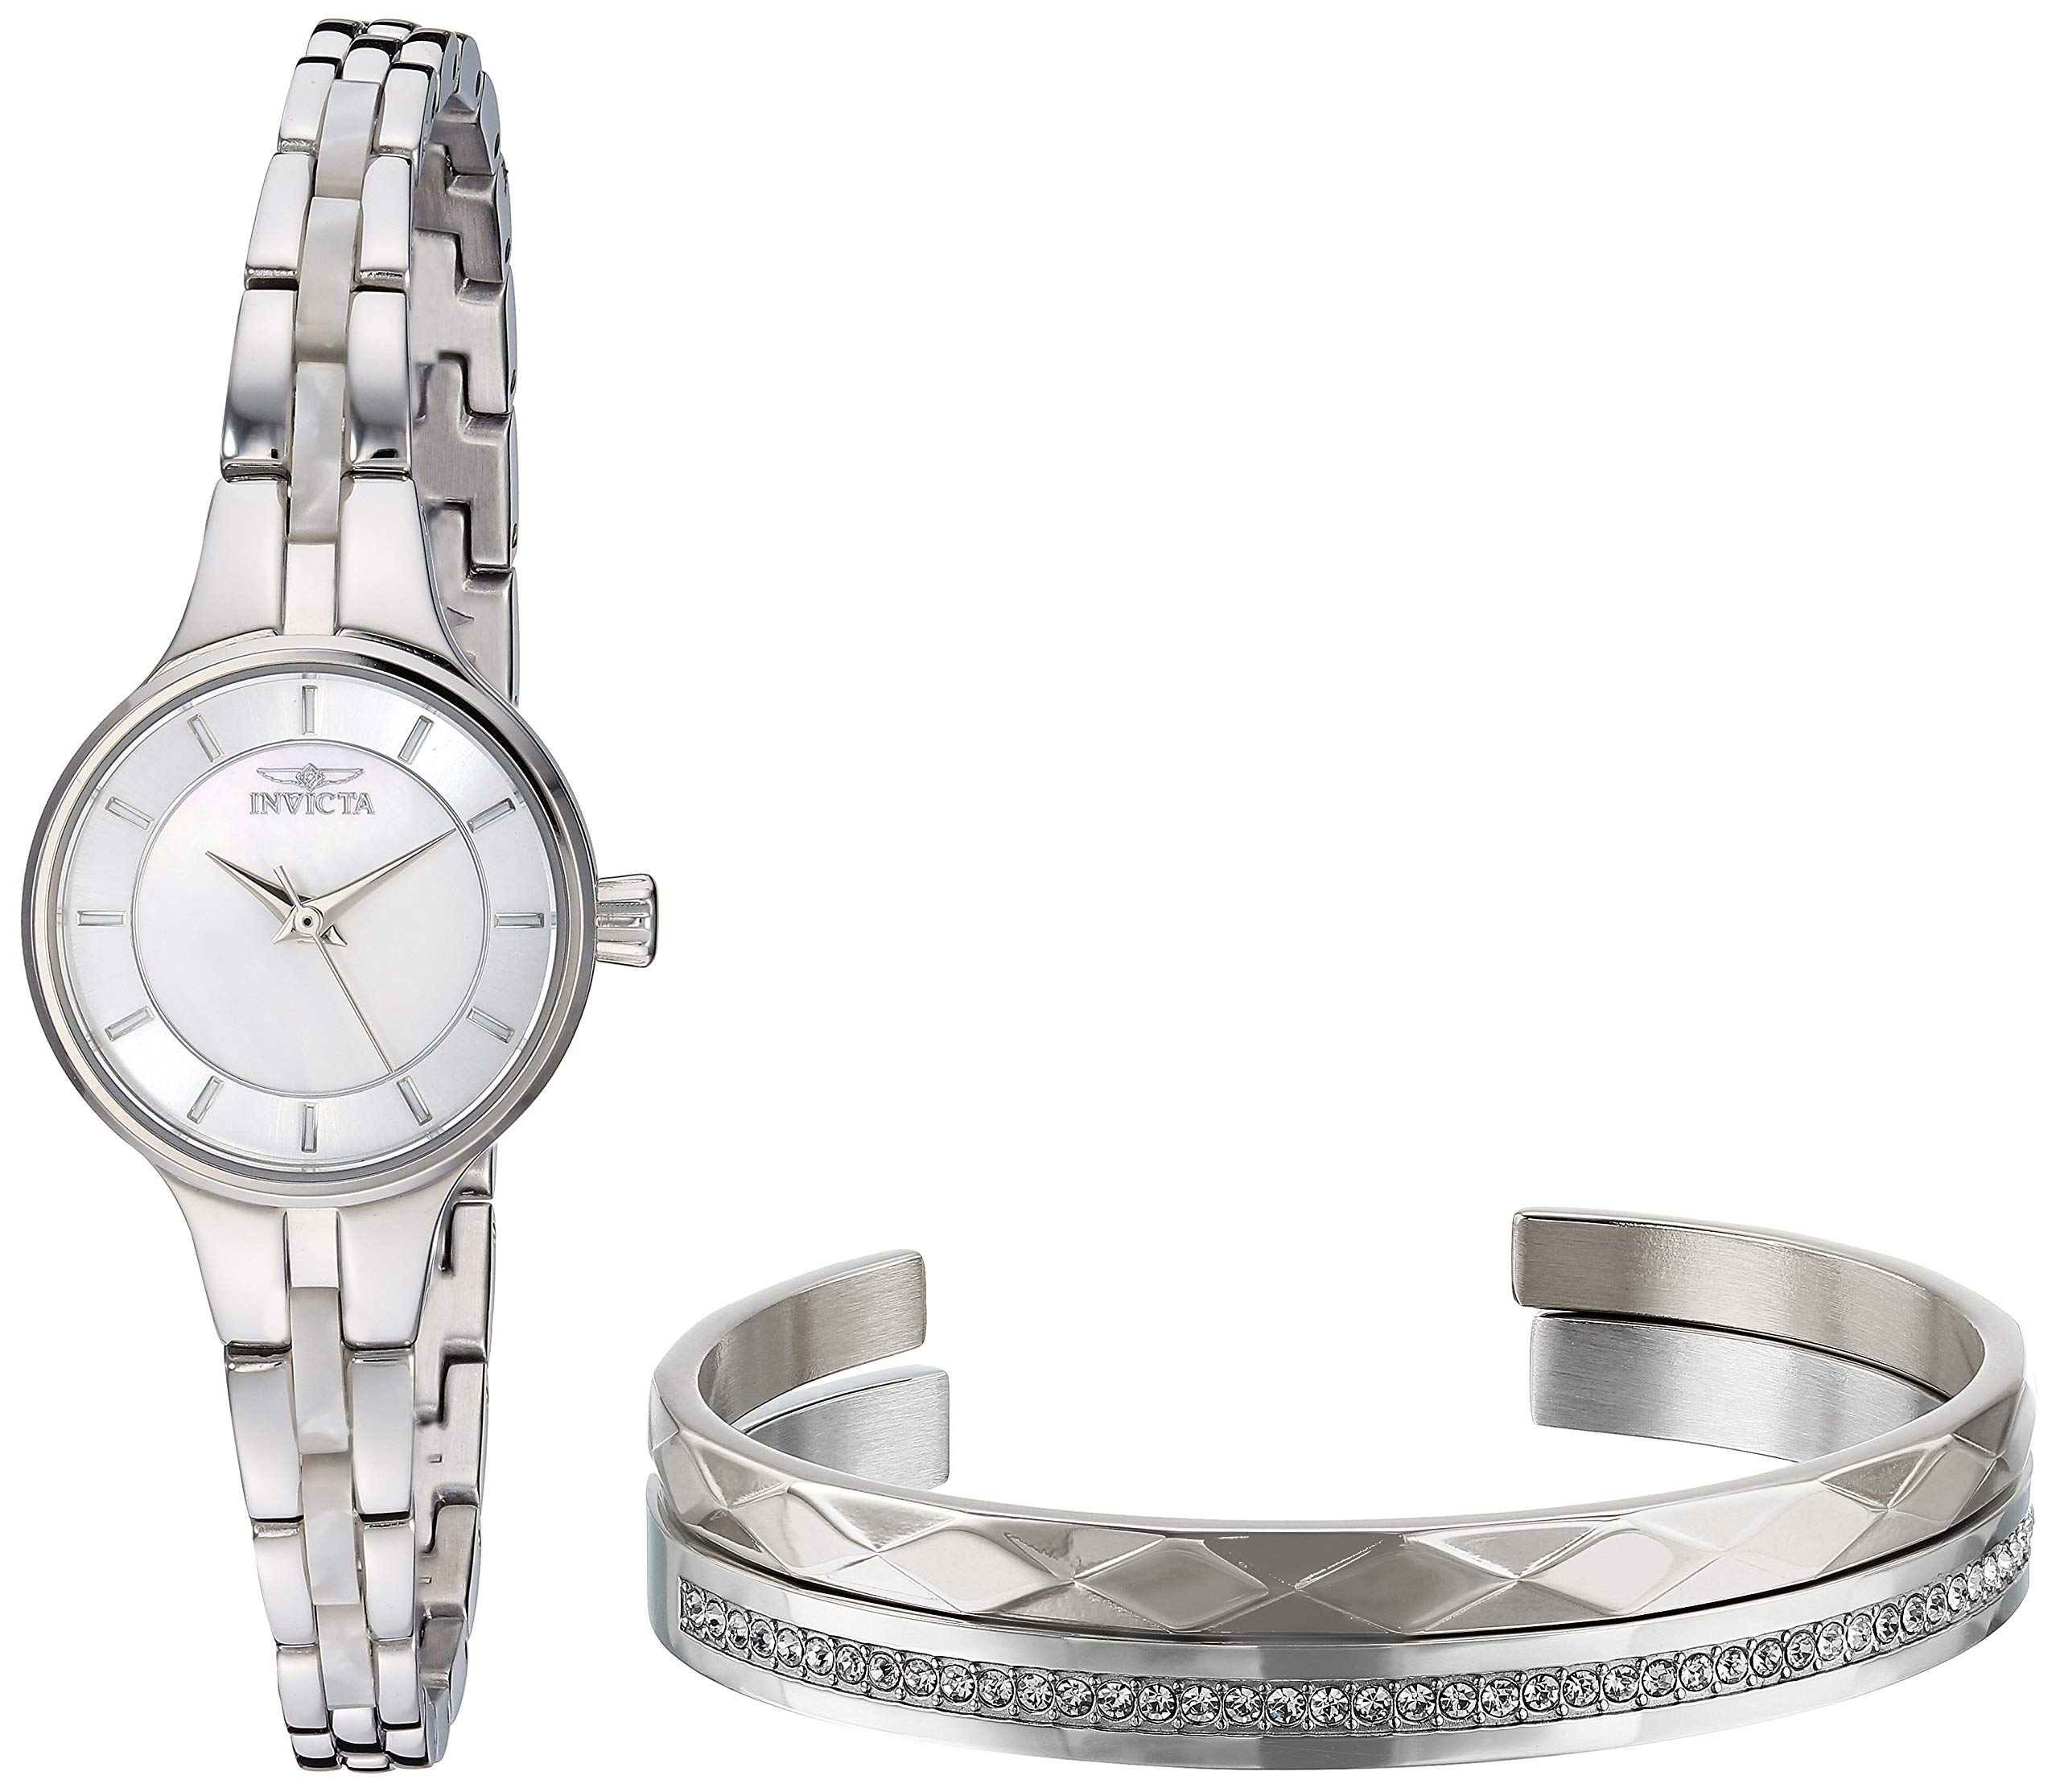 ویکالا · خرید  اصل اورجینال · خرید از آمازون · Invicta Women's Angel Quartz Watch with Stainless Steel Strap, Silver, 8 (Model: 29277) wekala · ویکالا